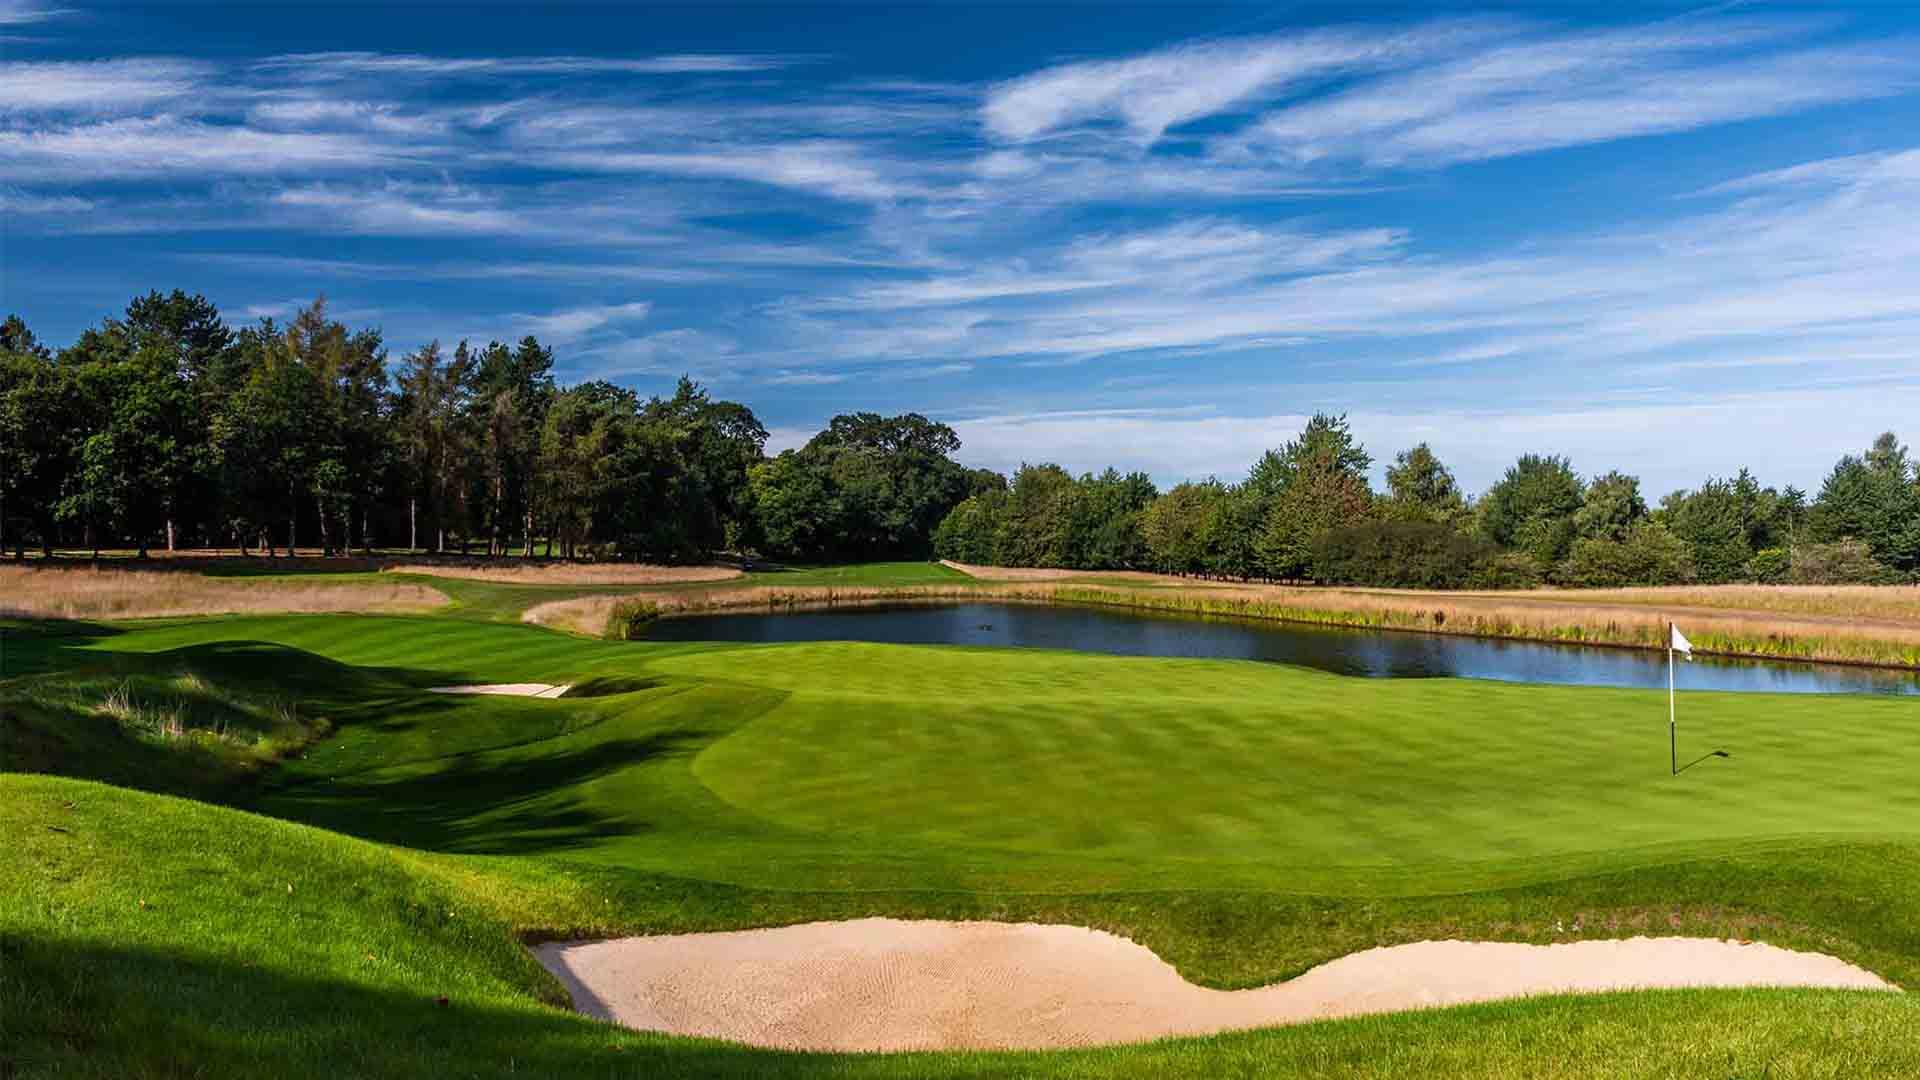 Royal Norwich Golf Course